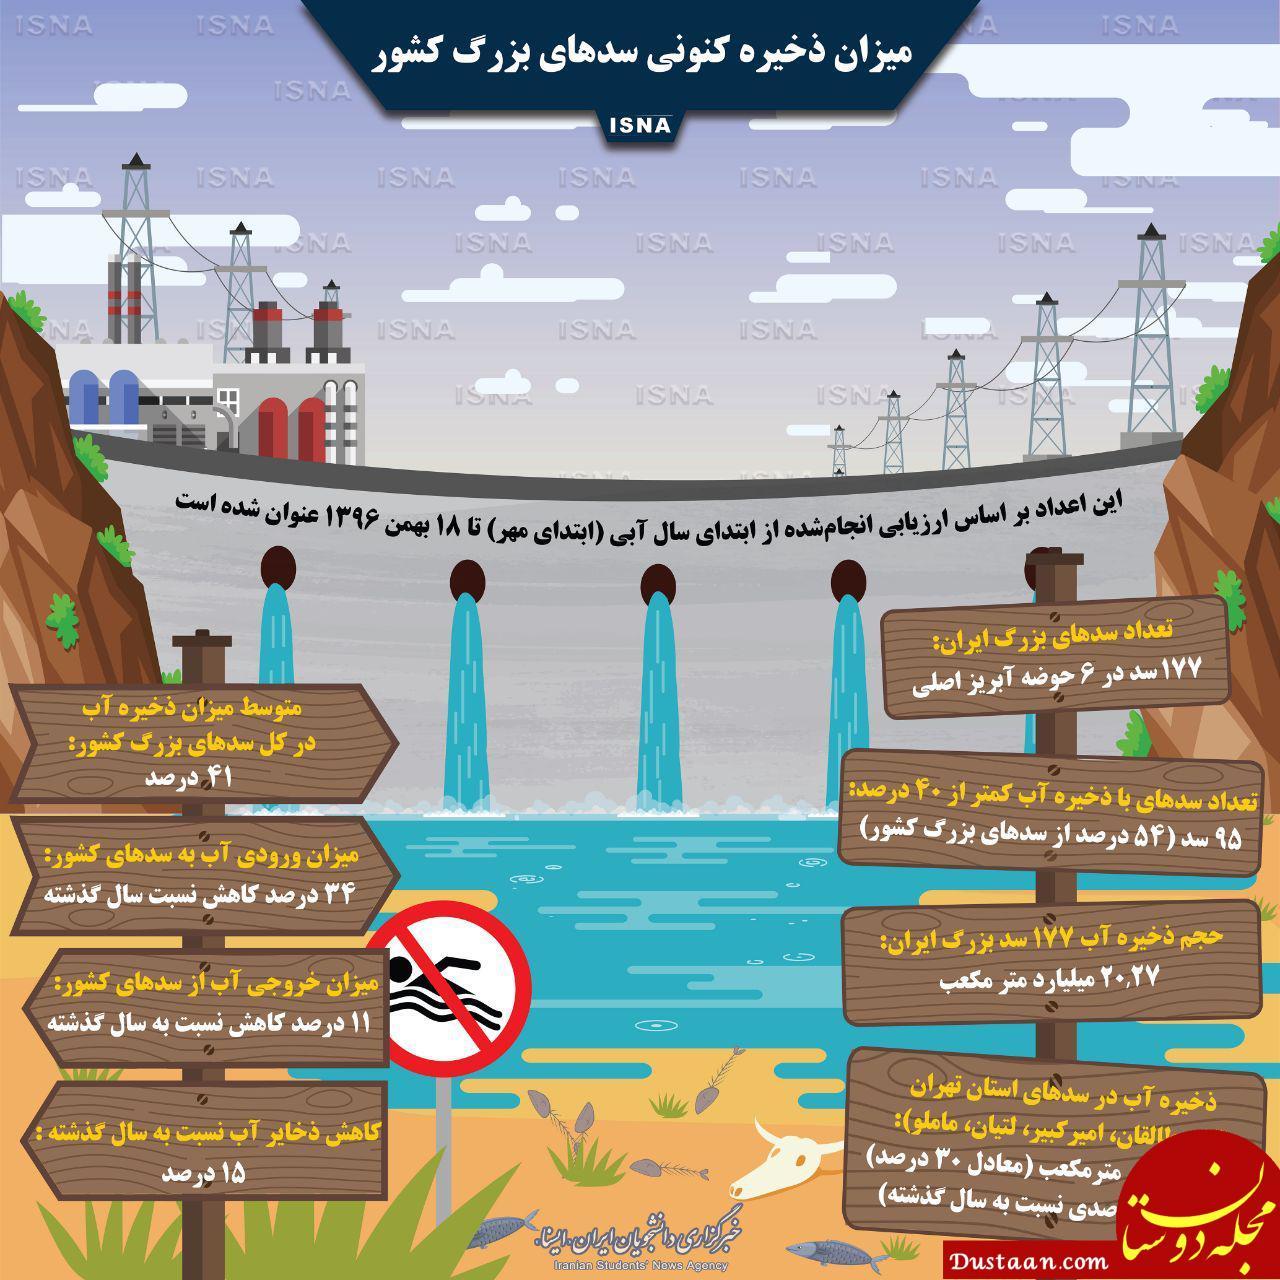 www.dustaan.com میزان ذخیره کنونی سدهای بزرگ کشور +اینفوگرافیک